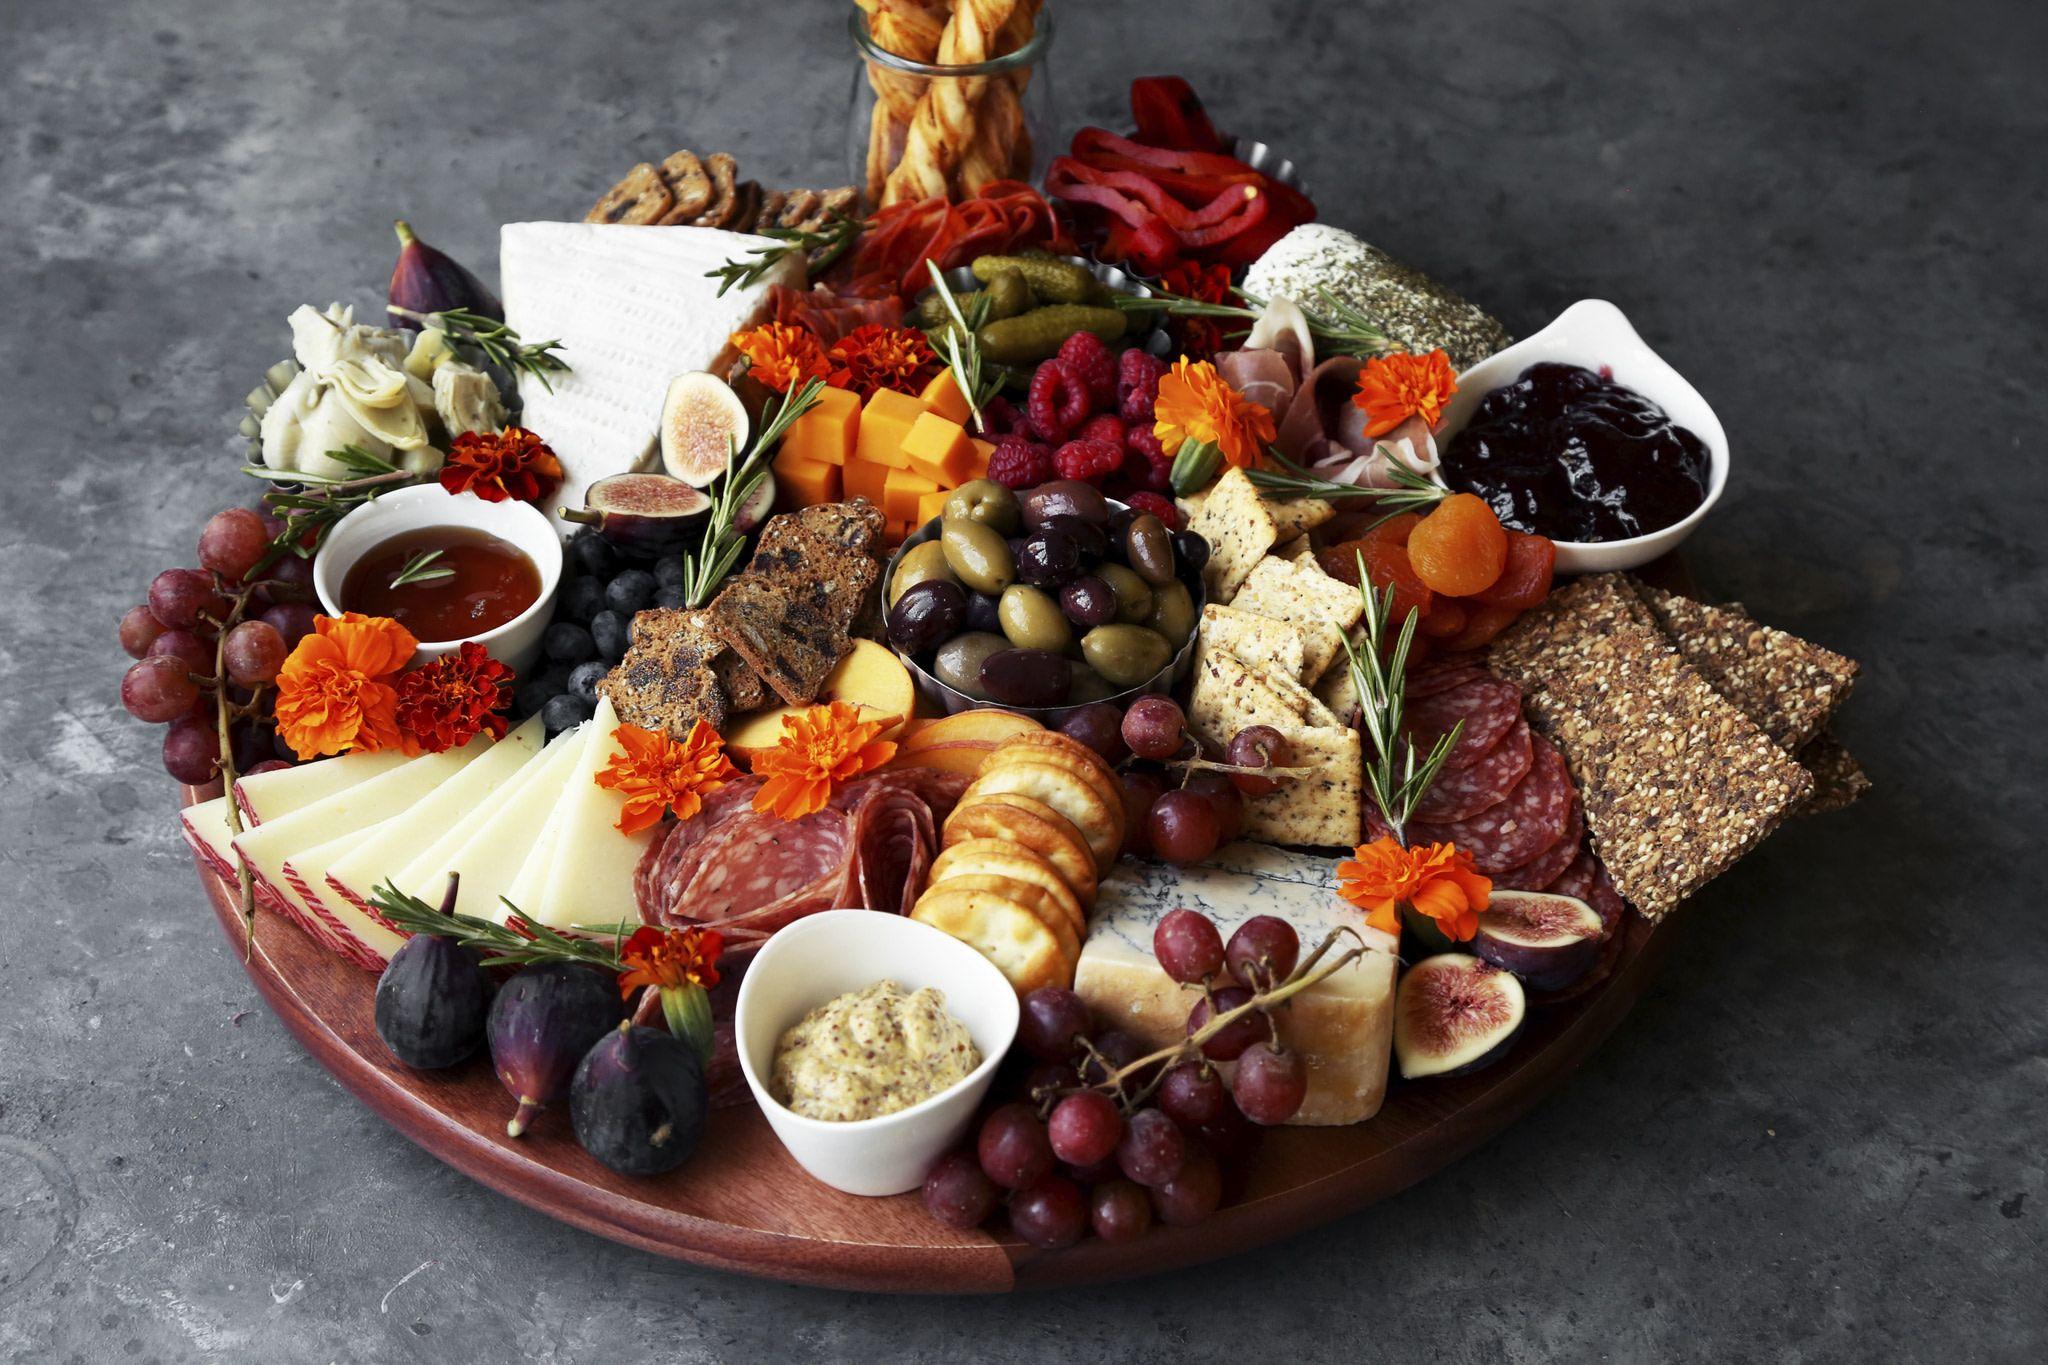 How To Build A Charcuterie Board - Food.com #hominycasserolepioneerwoman